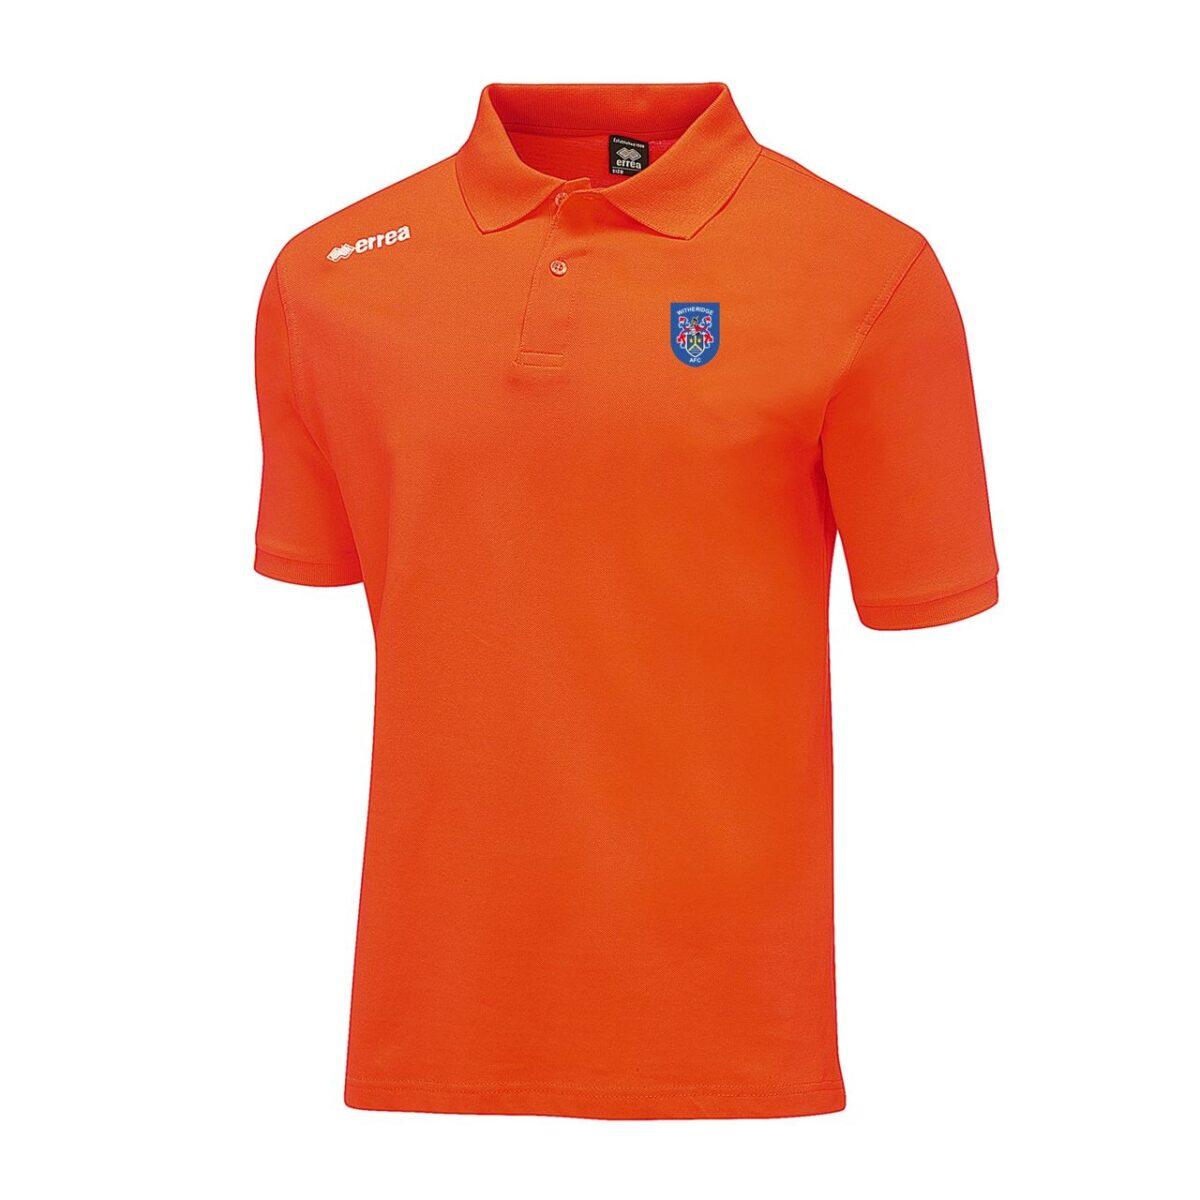 Witheridge Football Club Polo Shirt - Orange